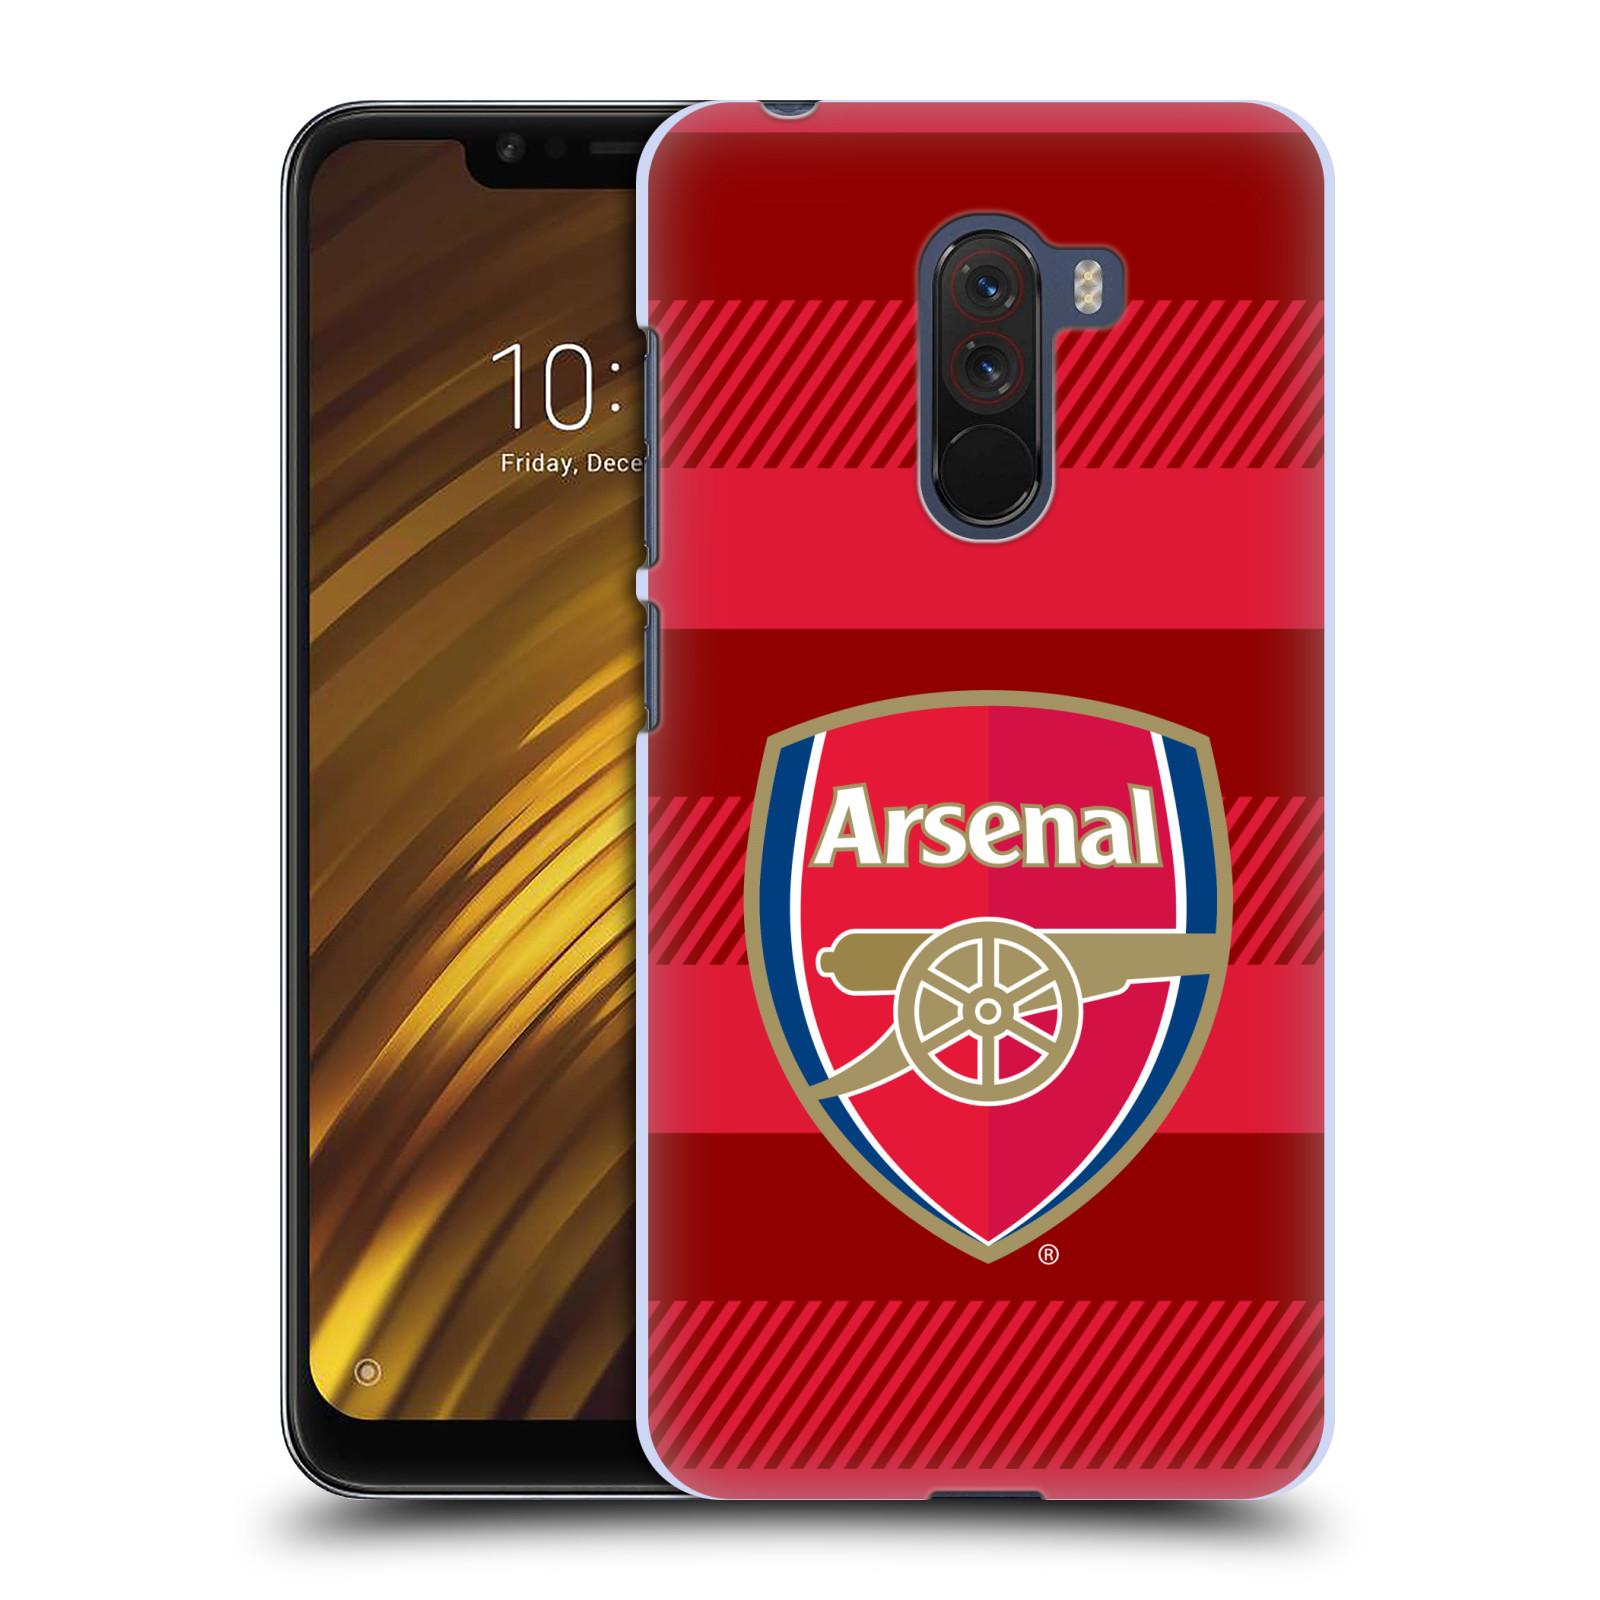 Plastové pouzdro na mobil Xiaomi Pocophone F1 - Head Case - Arsenal FC - Logo s pruhy